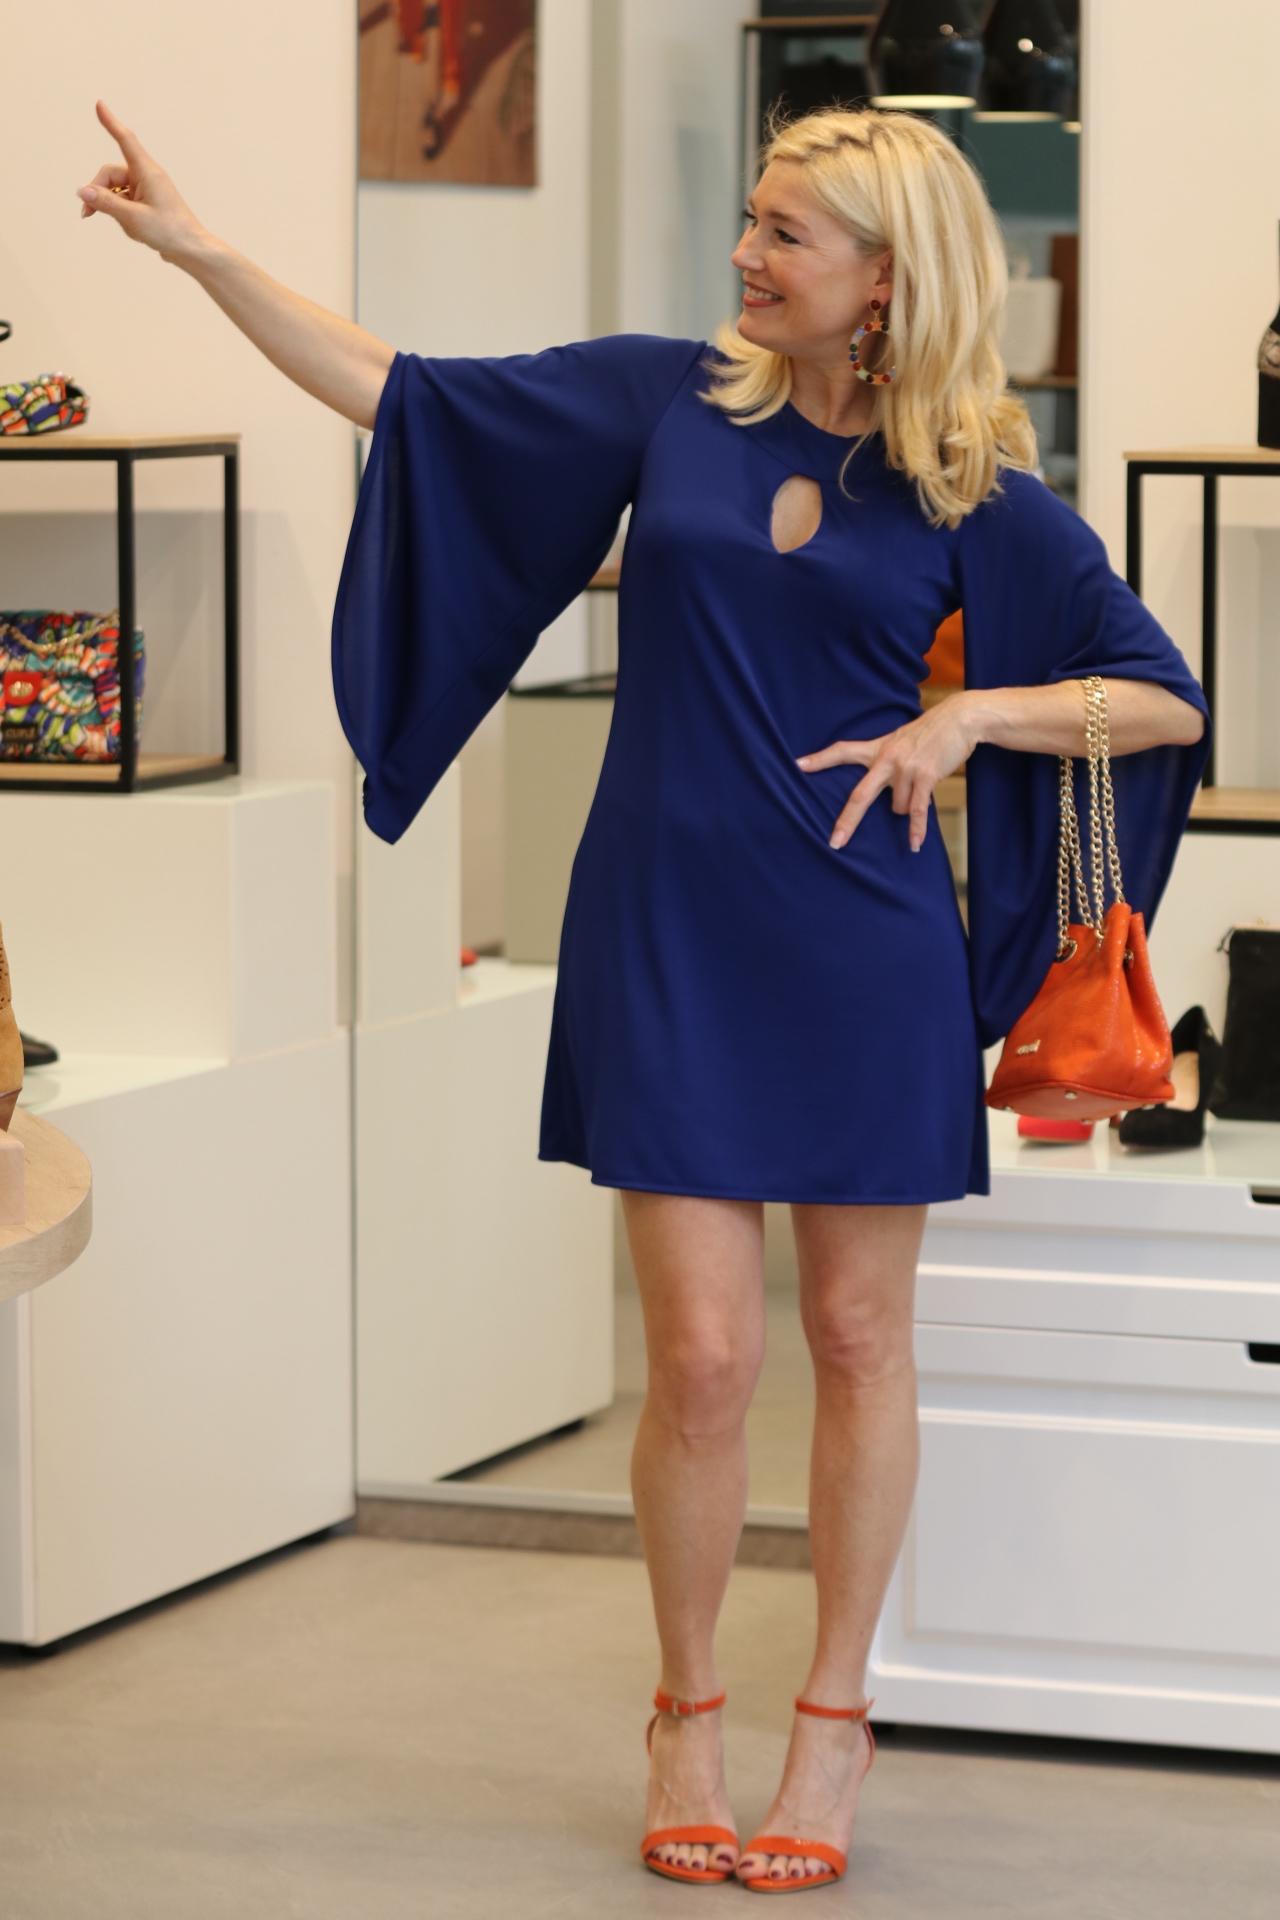 Cuplé Kleid, Cuplé, Cuplé Düsseldorf, CupléDuesseldorf, Fashion-Blog, Lieblingsstil.com,